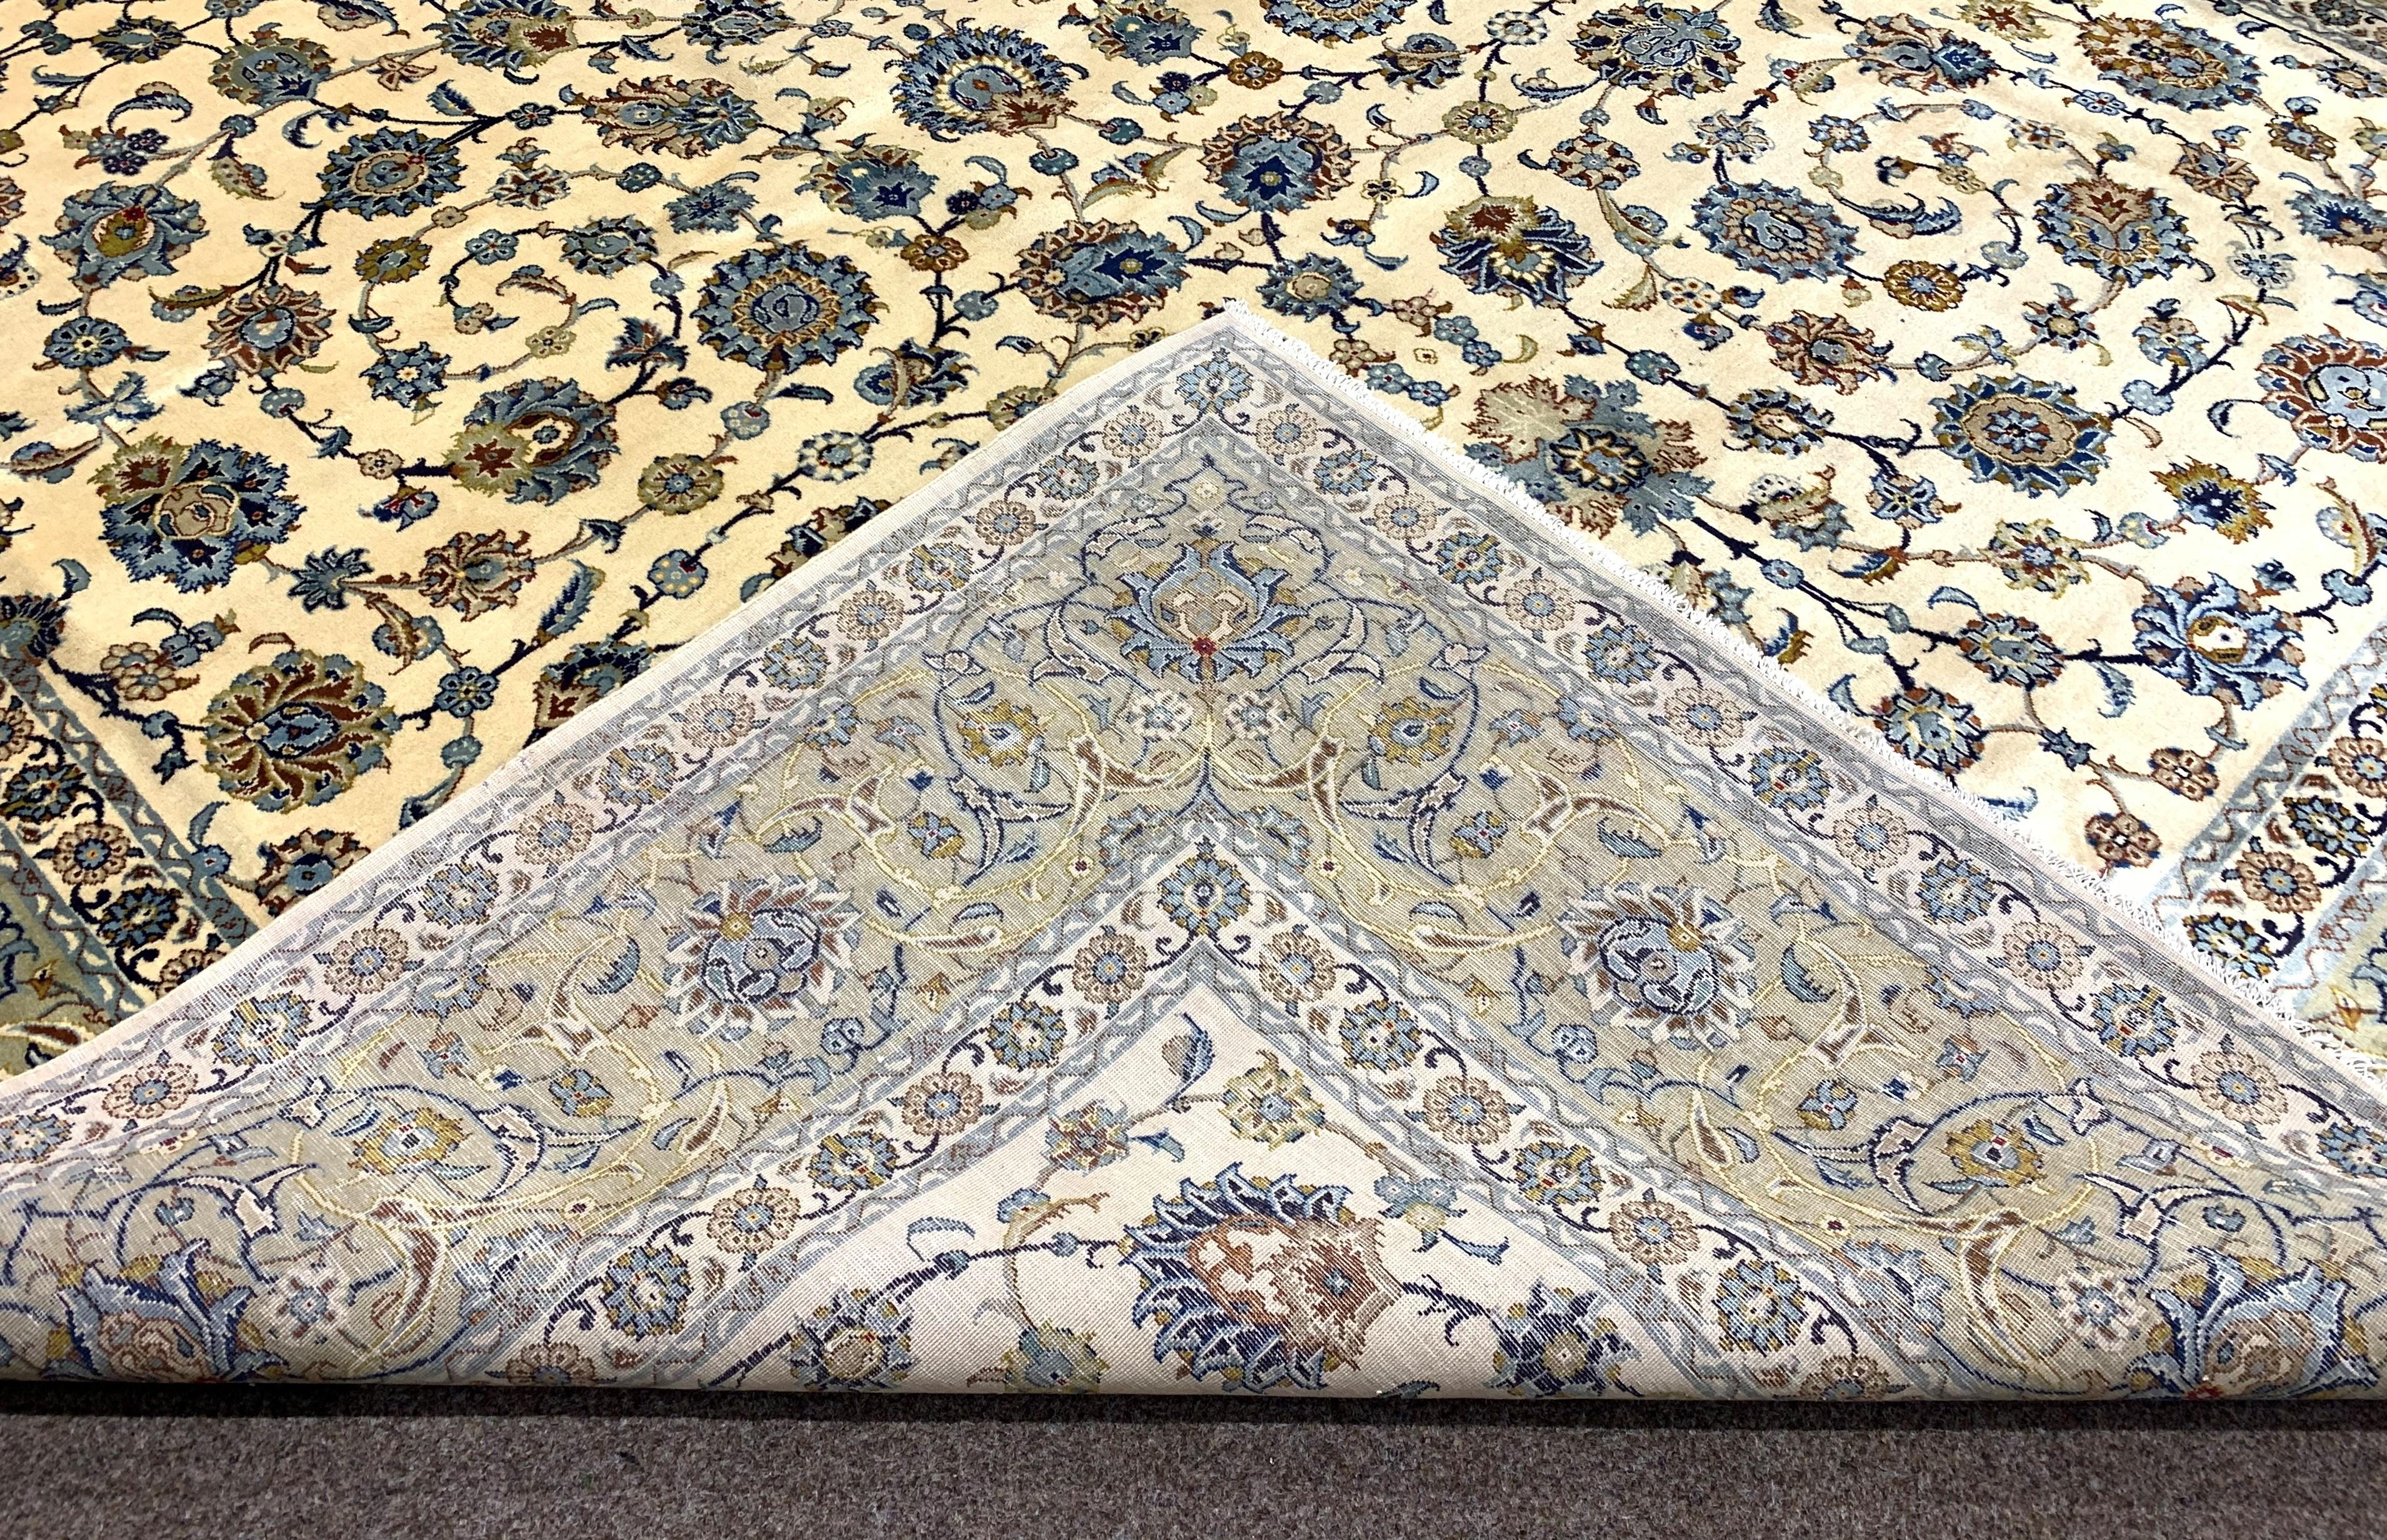 Large Persian Kashan carpet, ivory ground with interlacing foliage, decorated with stylised flower - Image 3 of 5